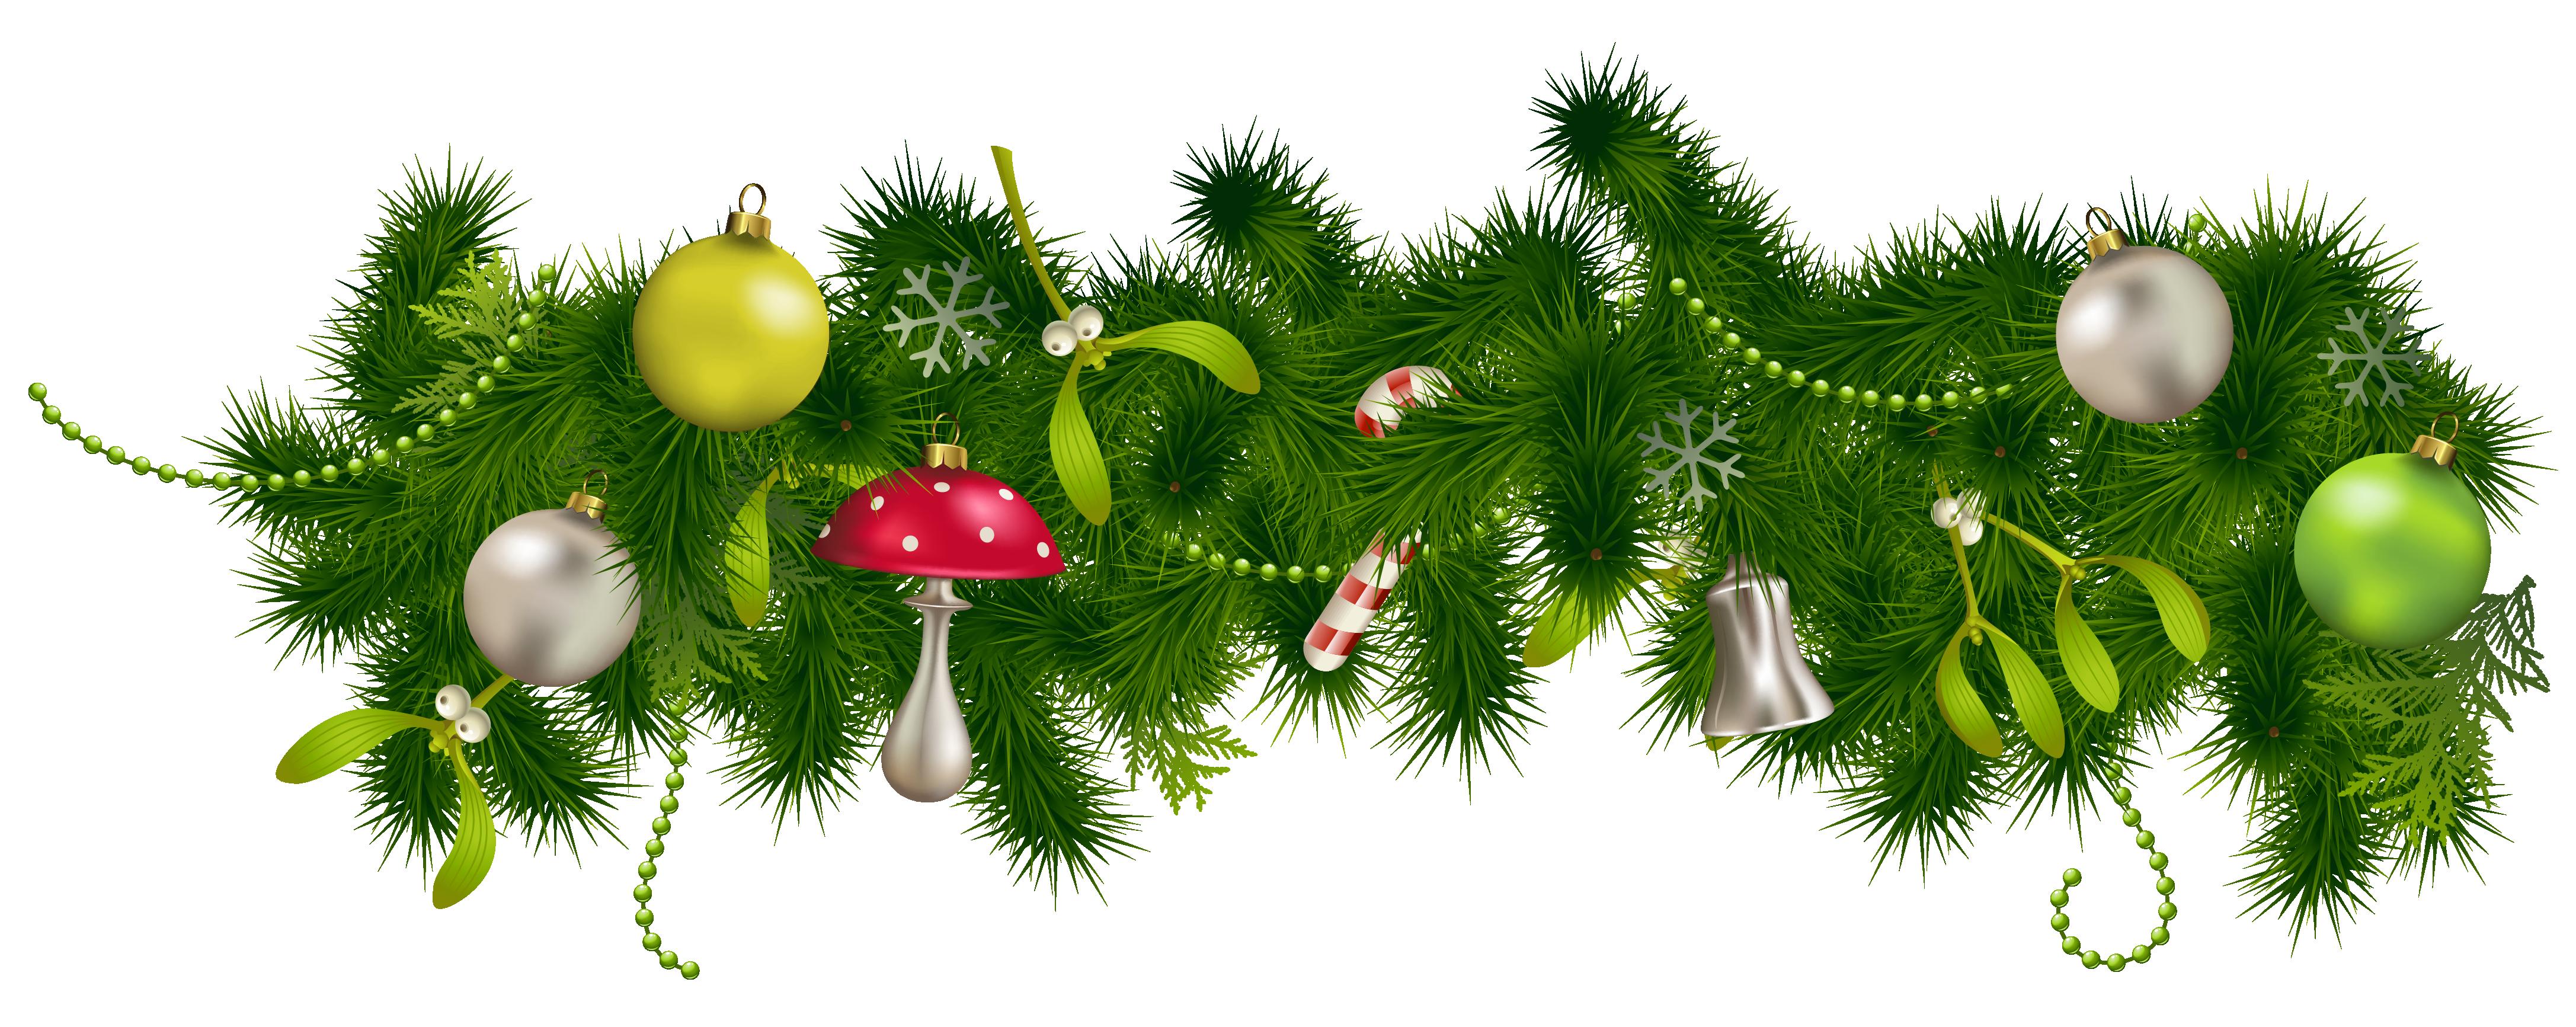 Christmas garland clipart transparent stock Transparent Christmas Pine Garland Decor PNG Clipart | Gallery ... transparent stock